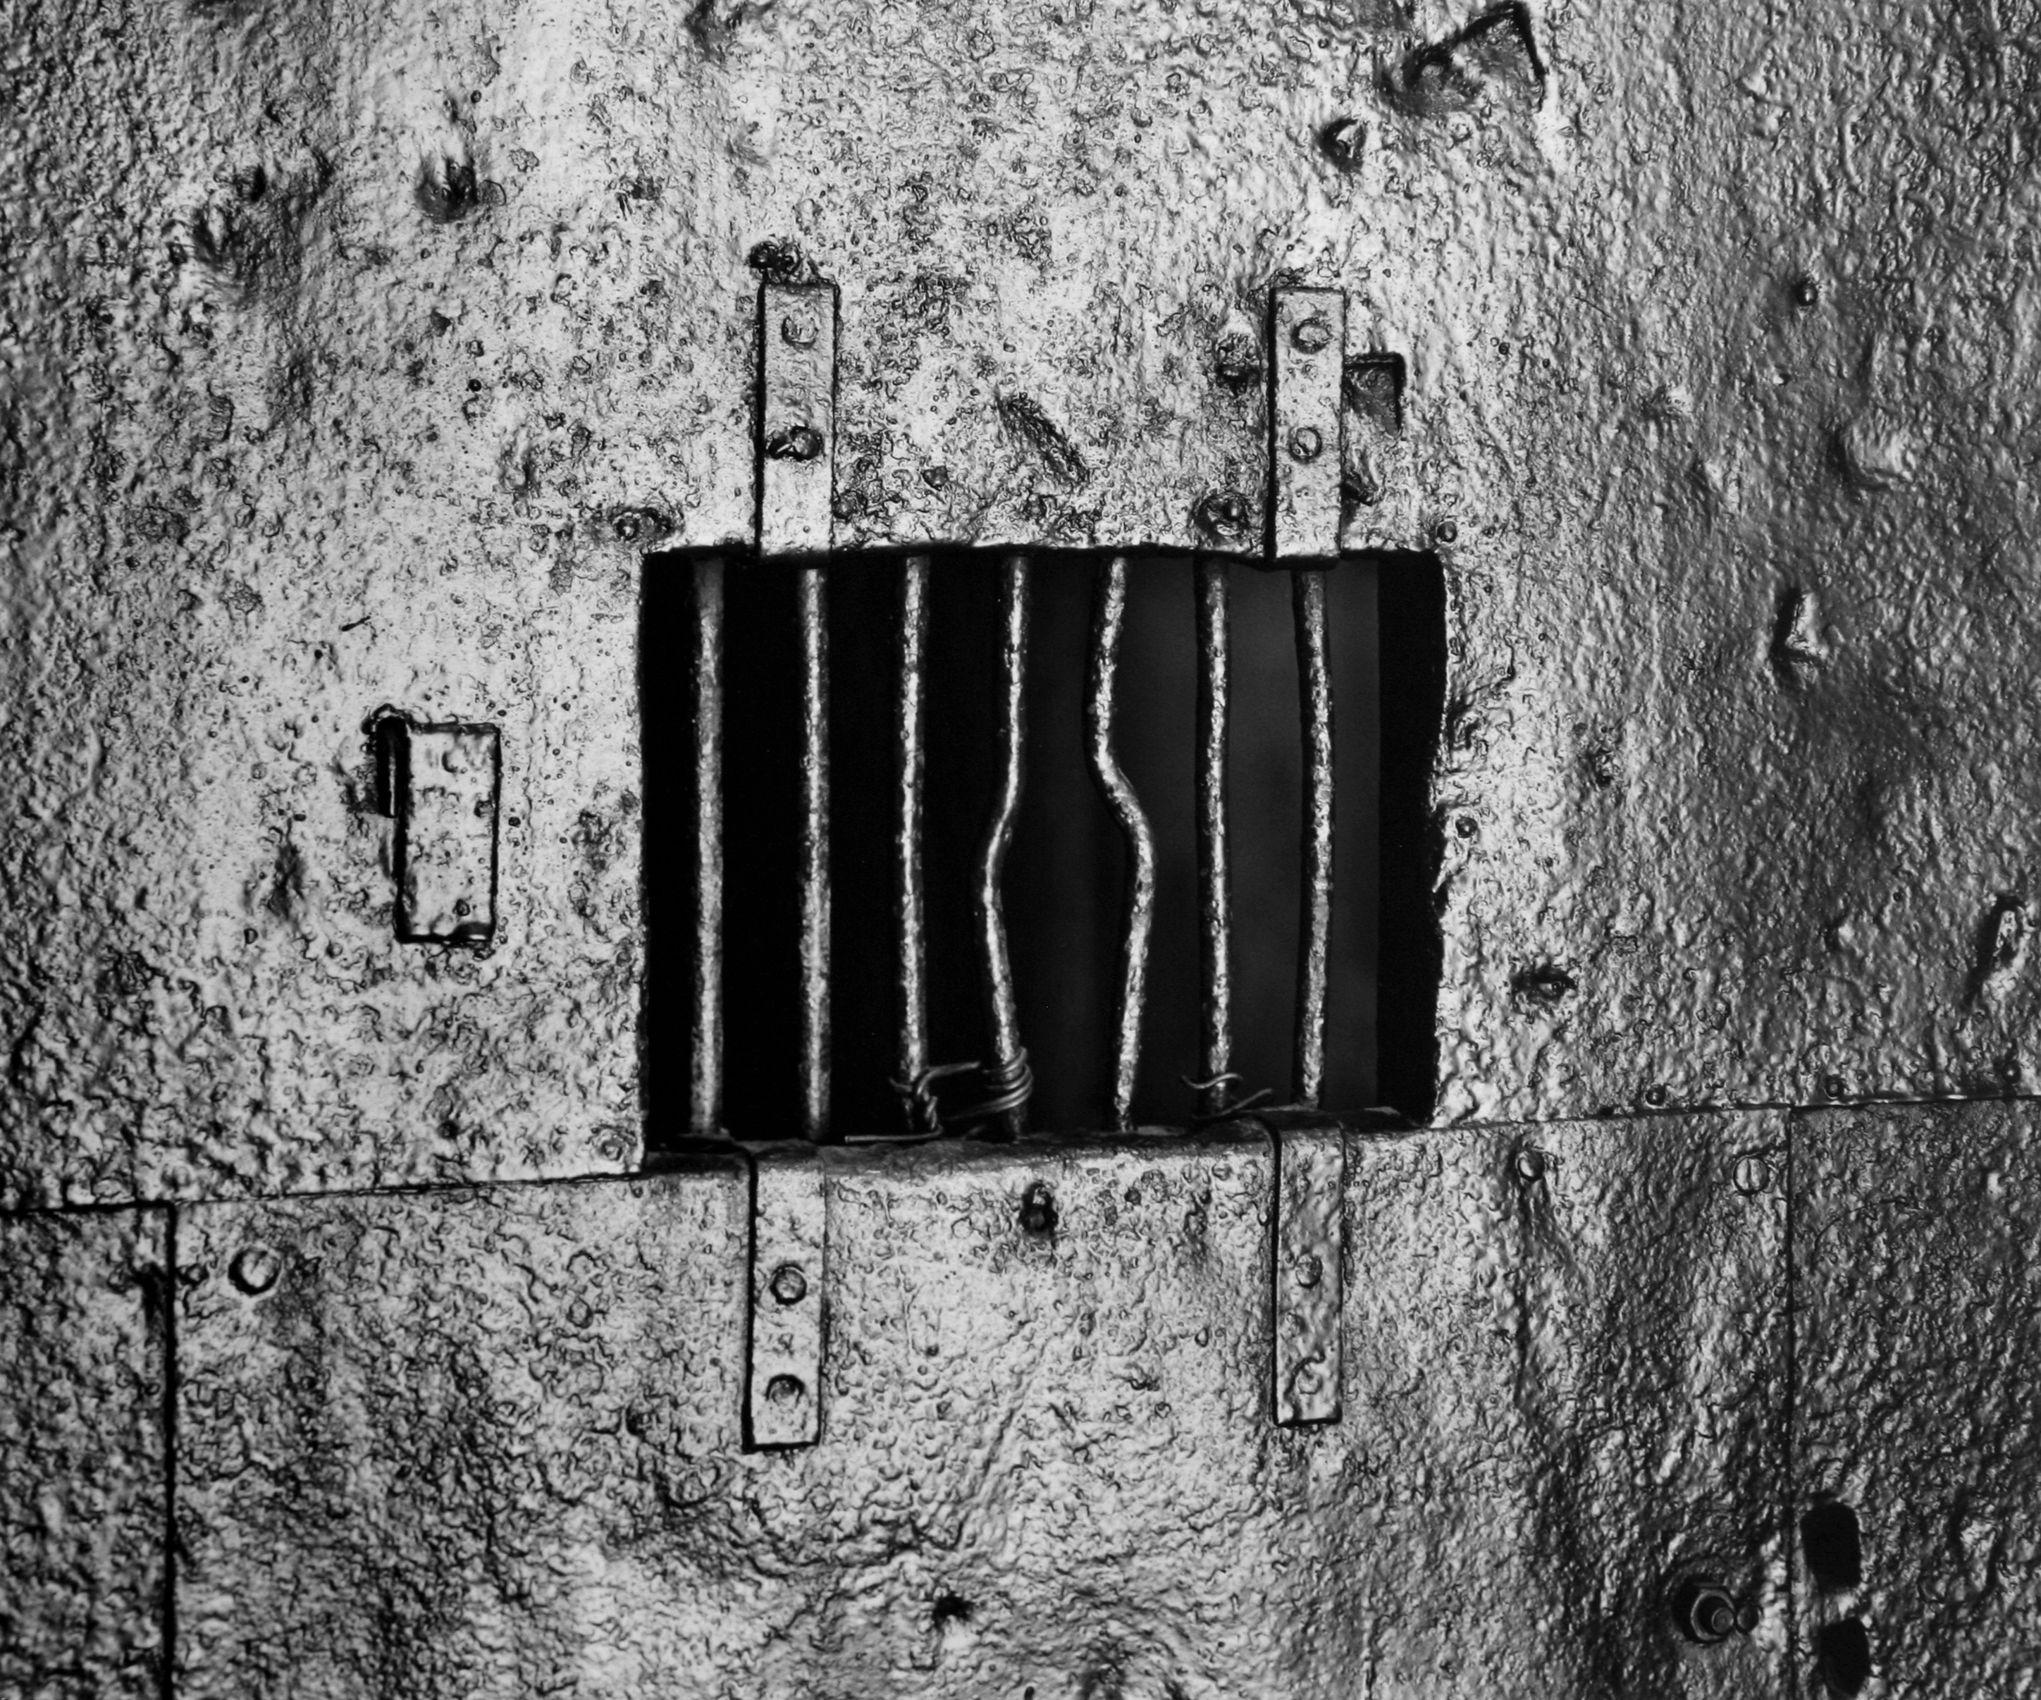 Condemned PrisonerCell, Hanoi Central Prison